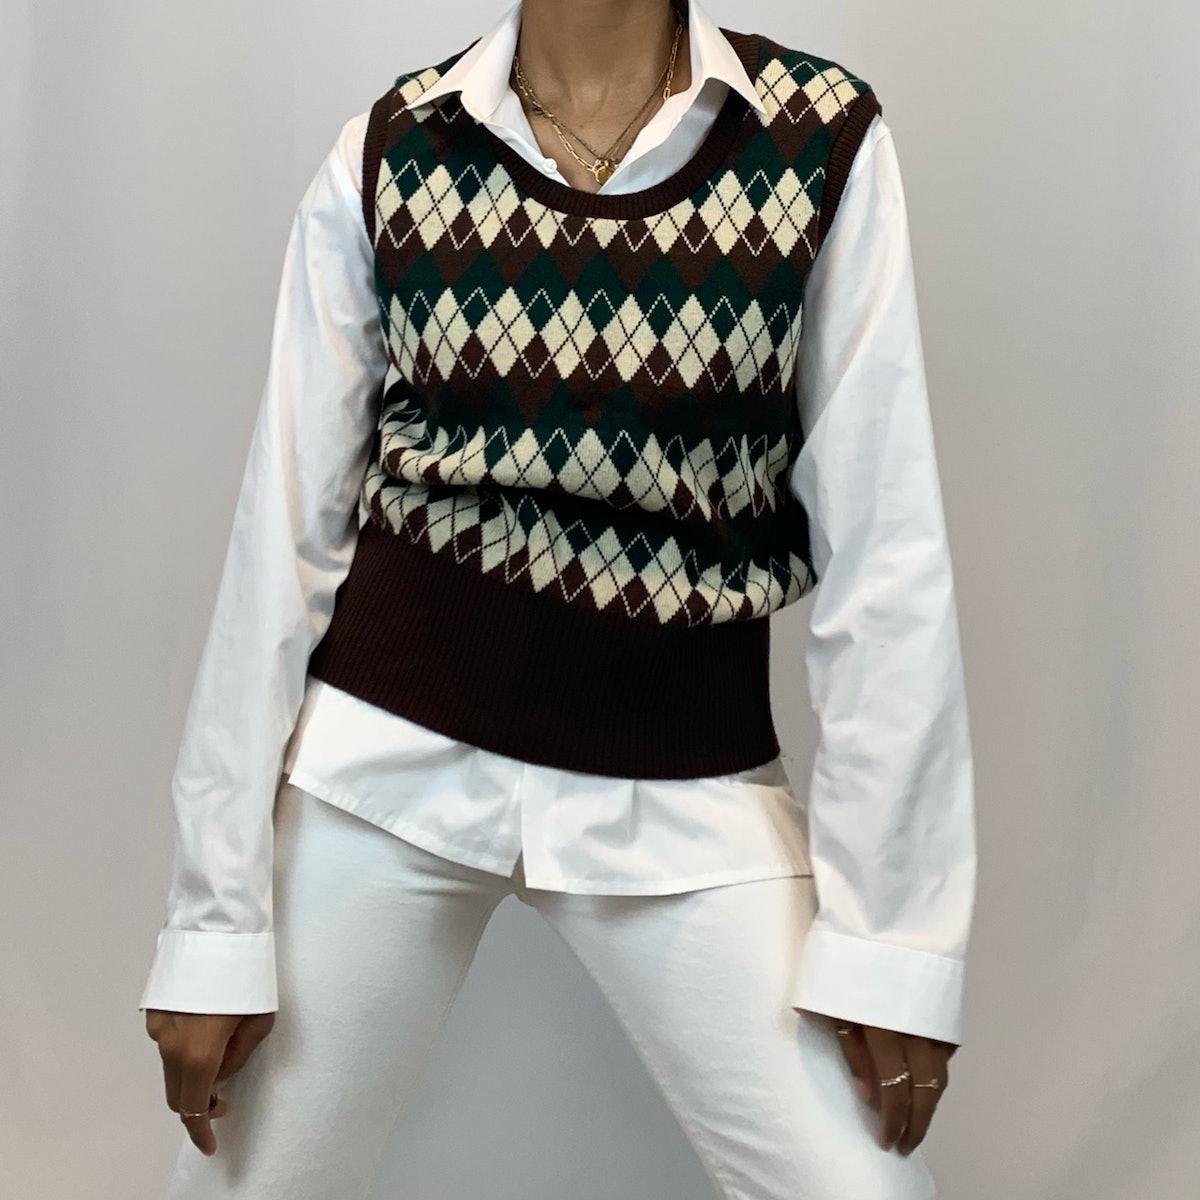 AutumnCTR Vintage Brown, Green, & Beige Knit Sweater Vest